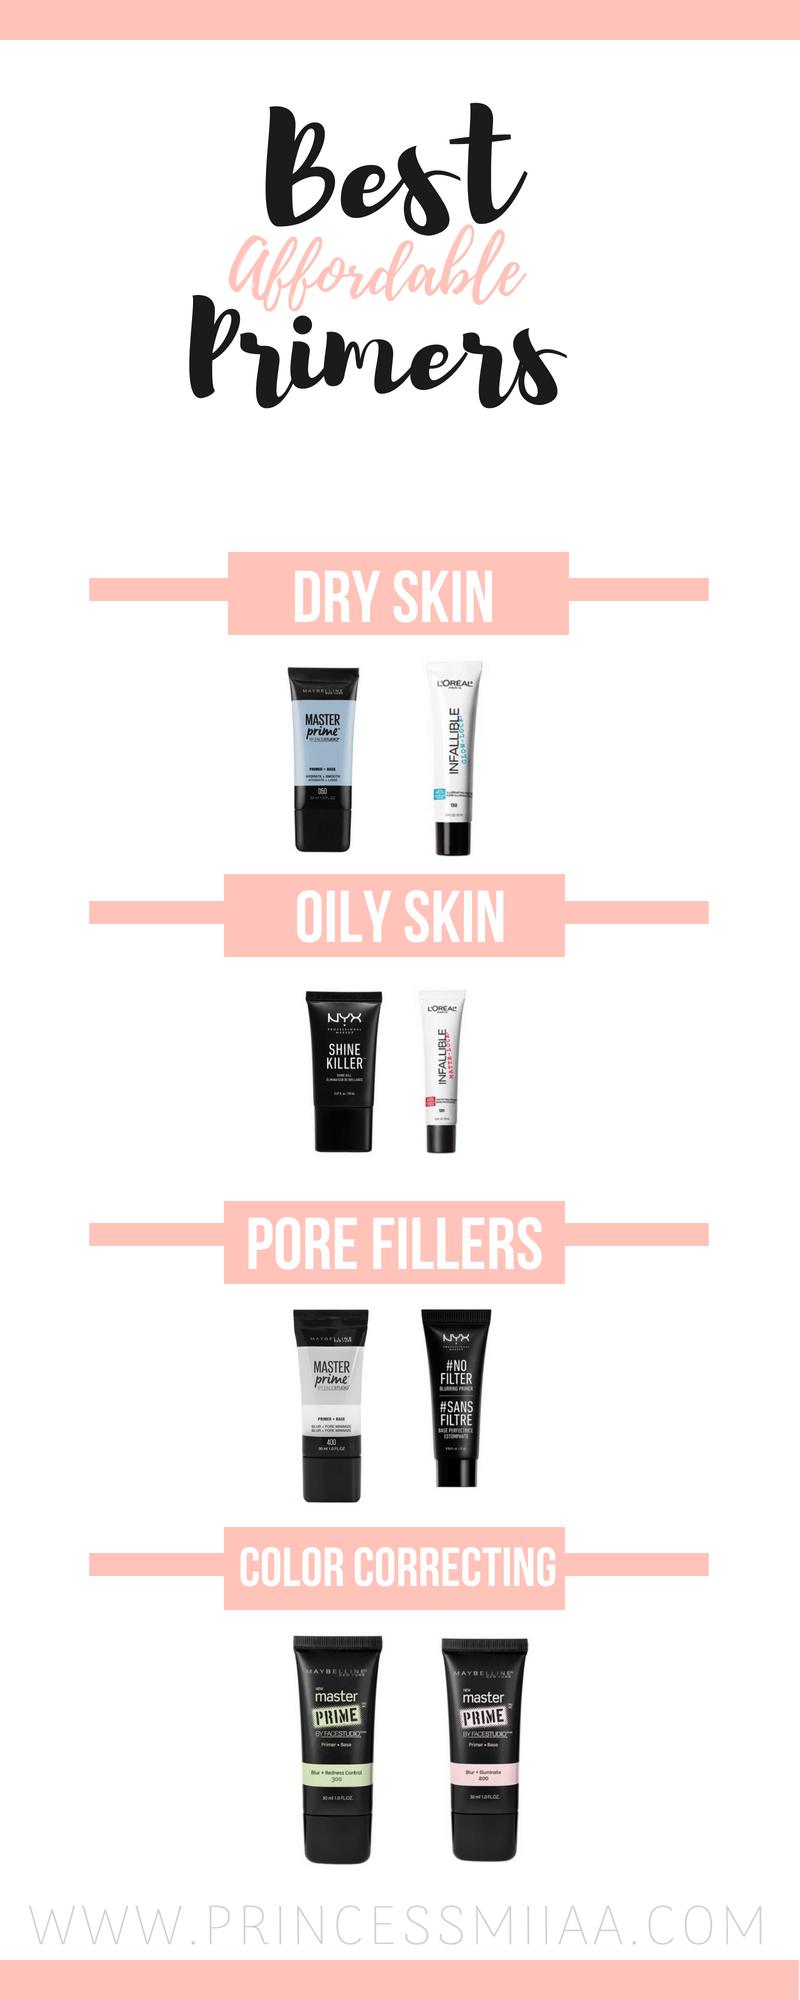 Princessmiiaa Com Nbspprincessmiiaa Resources And Information Best Drugstore Primer Drugstore Primer Primer For Dry Skin